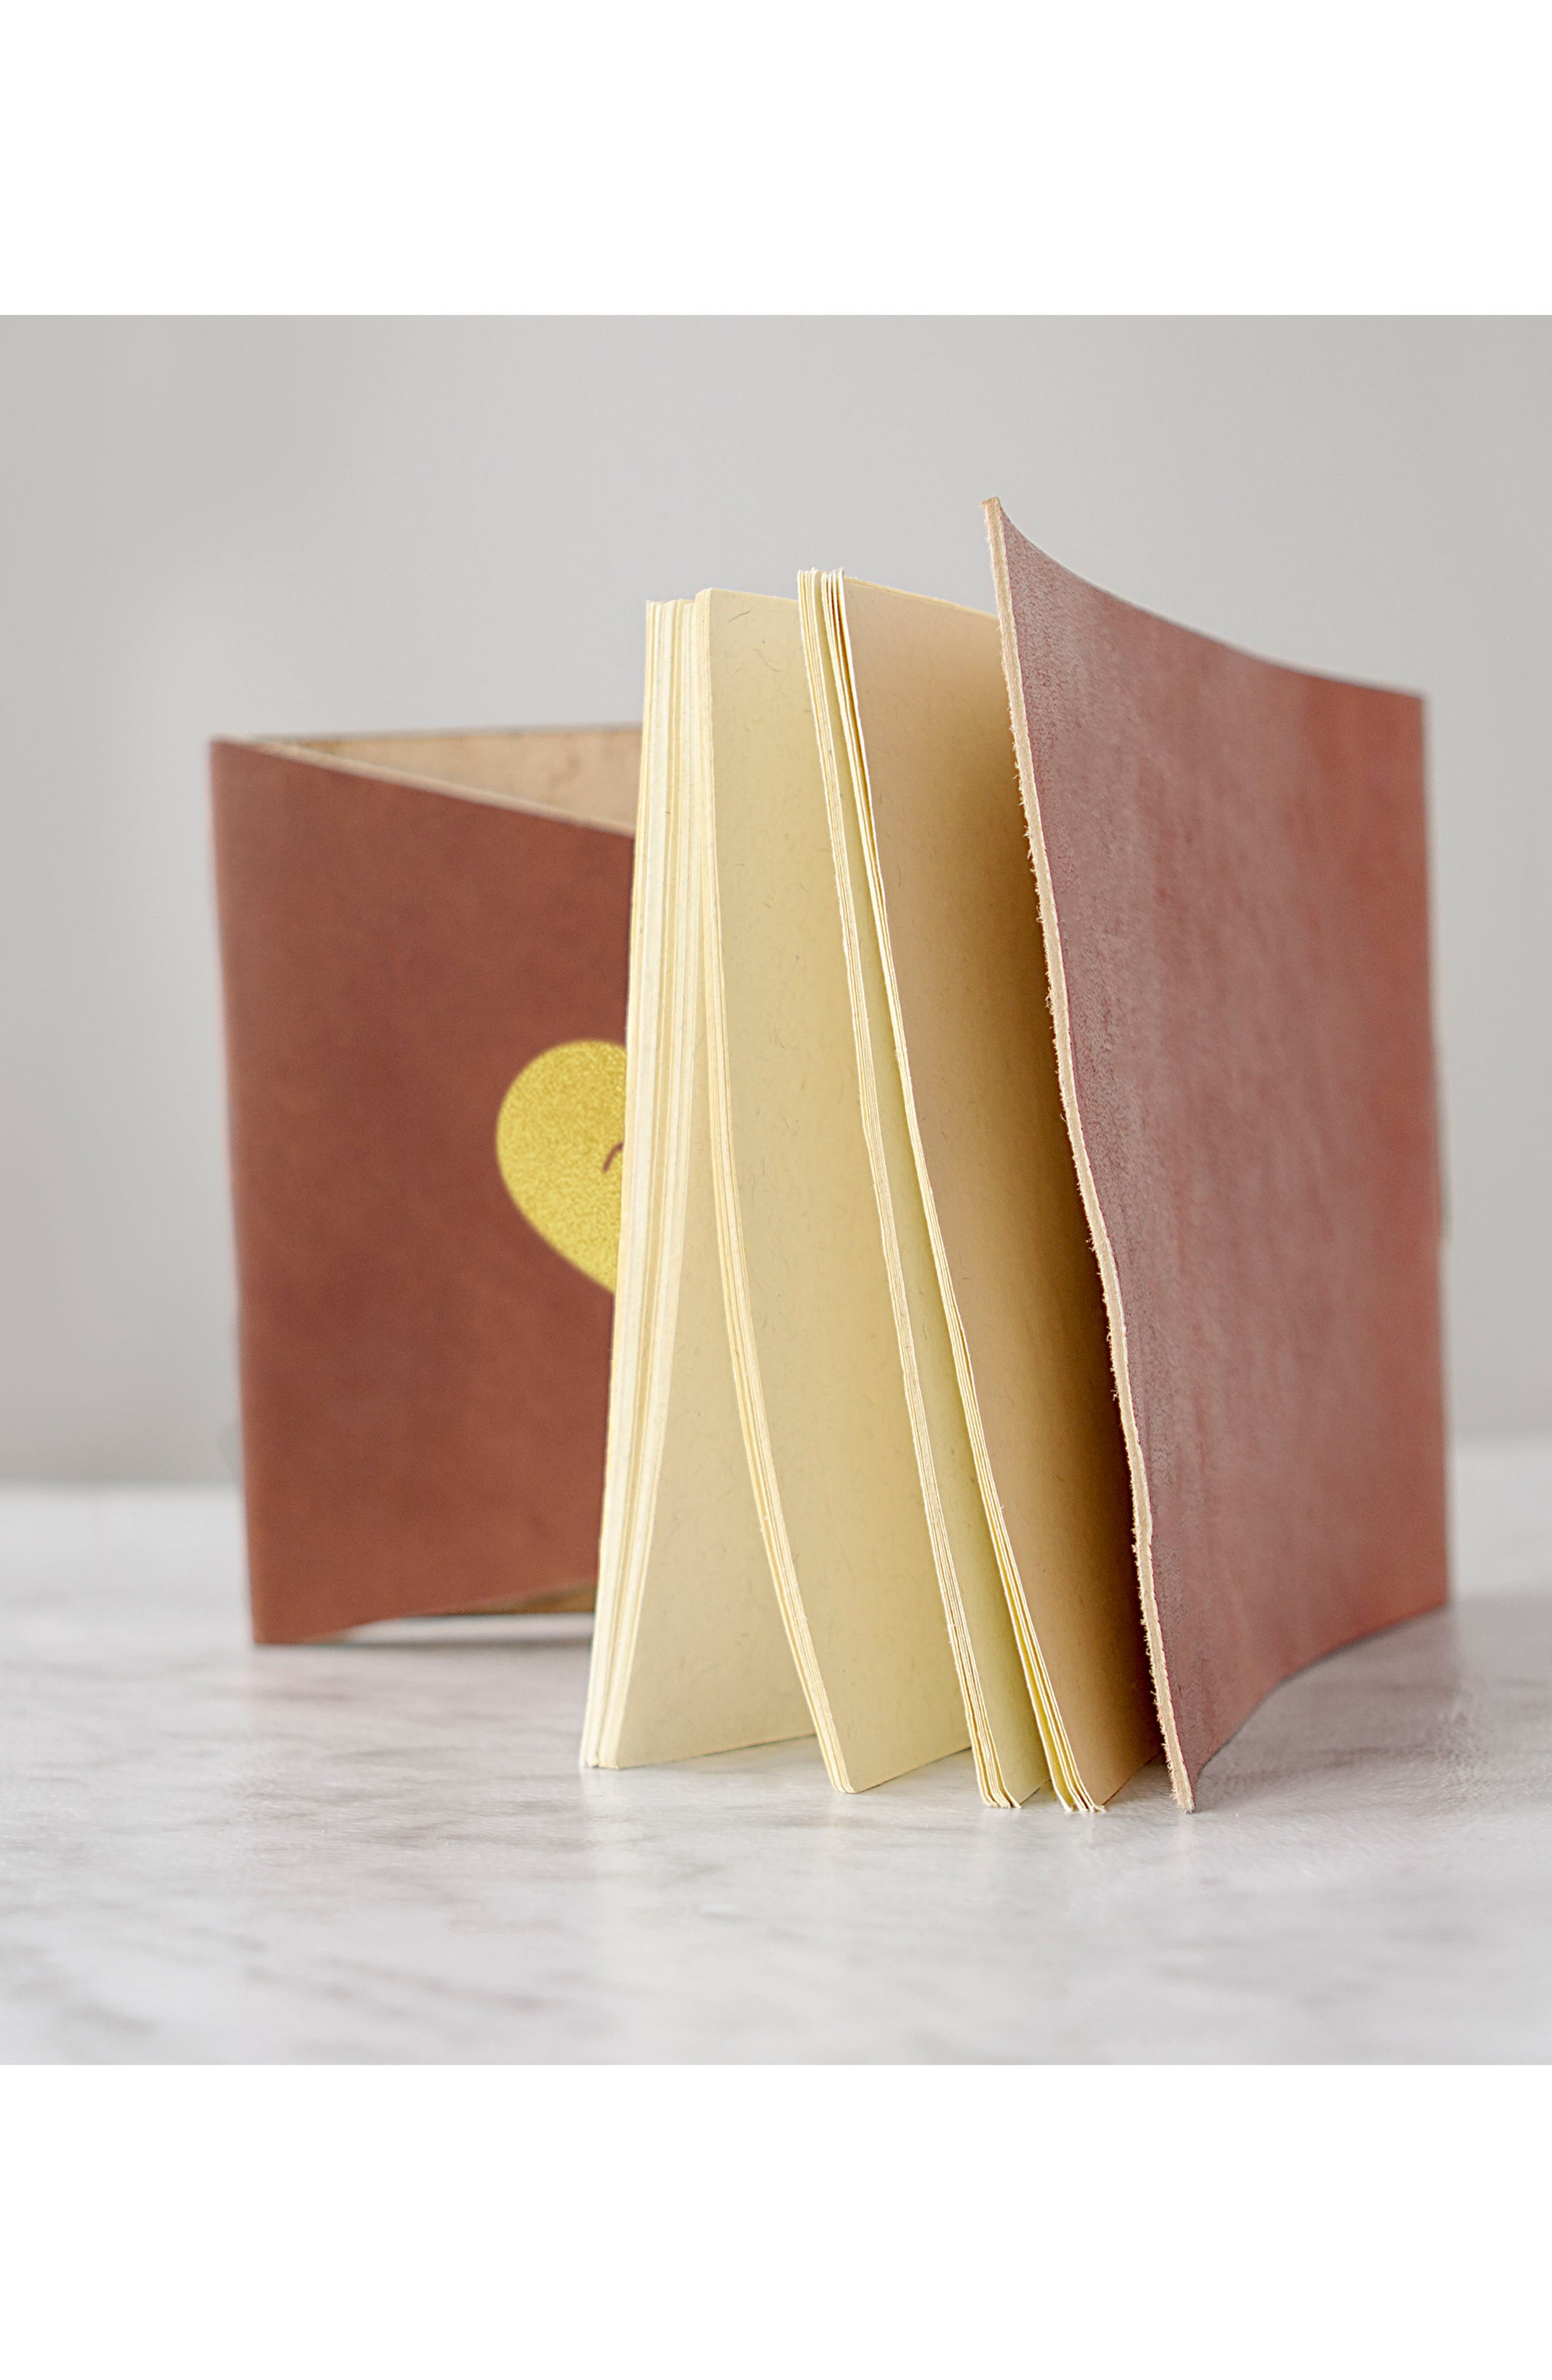 Monogram Leather Guest Book,                             Alternate thumbnail 10, color,                             710